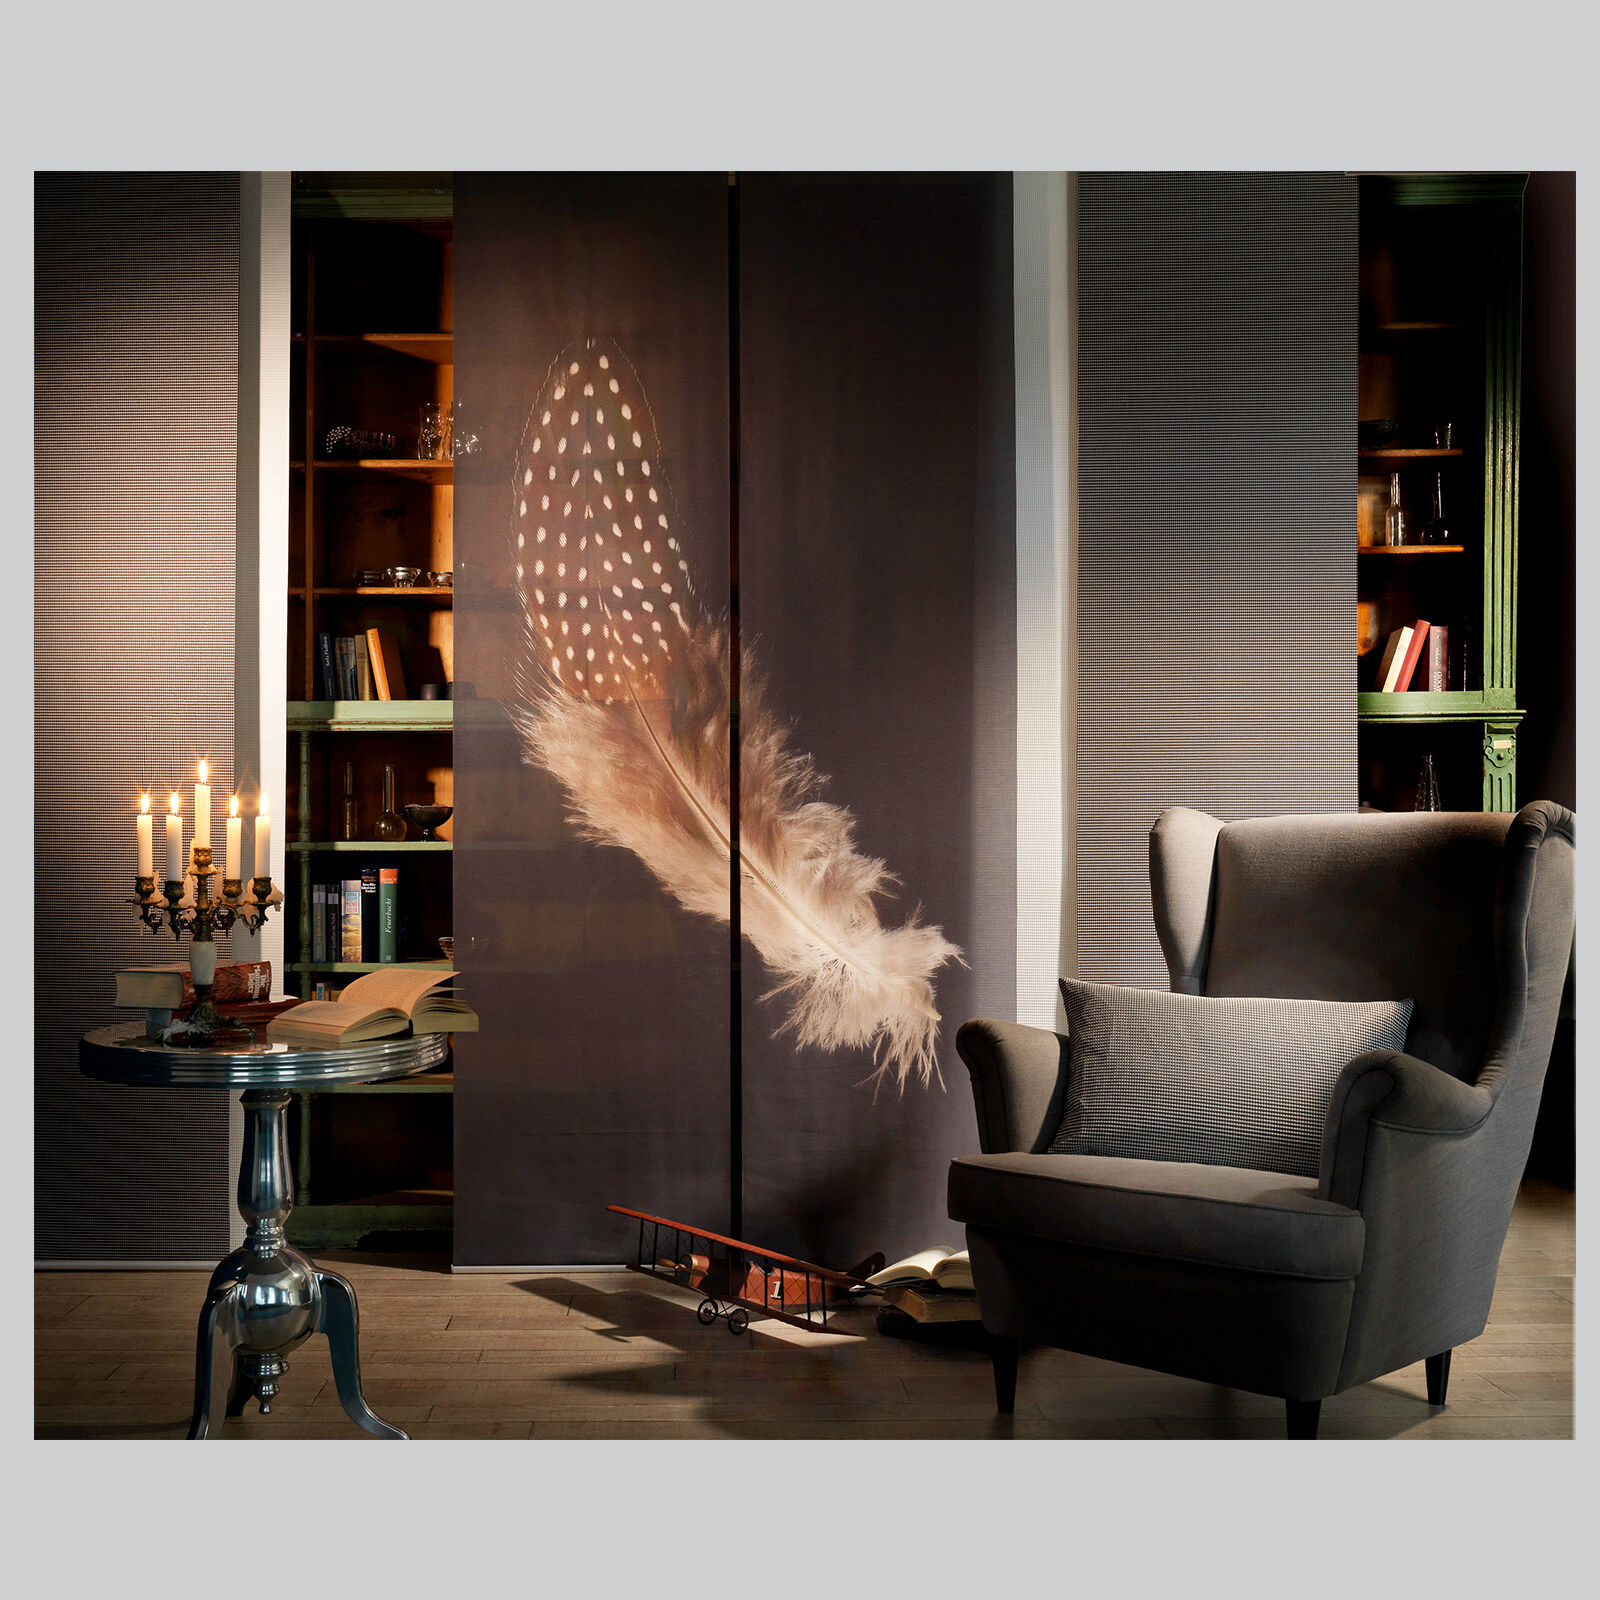 Feder foto schiebevorhang raumteiler paneele - Raumteiler schiebevorhang ...